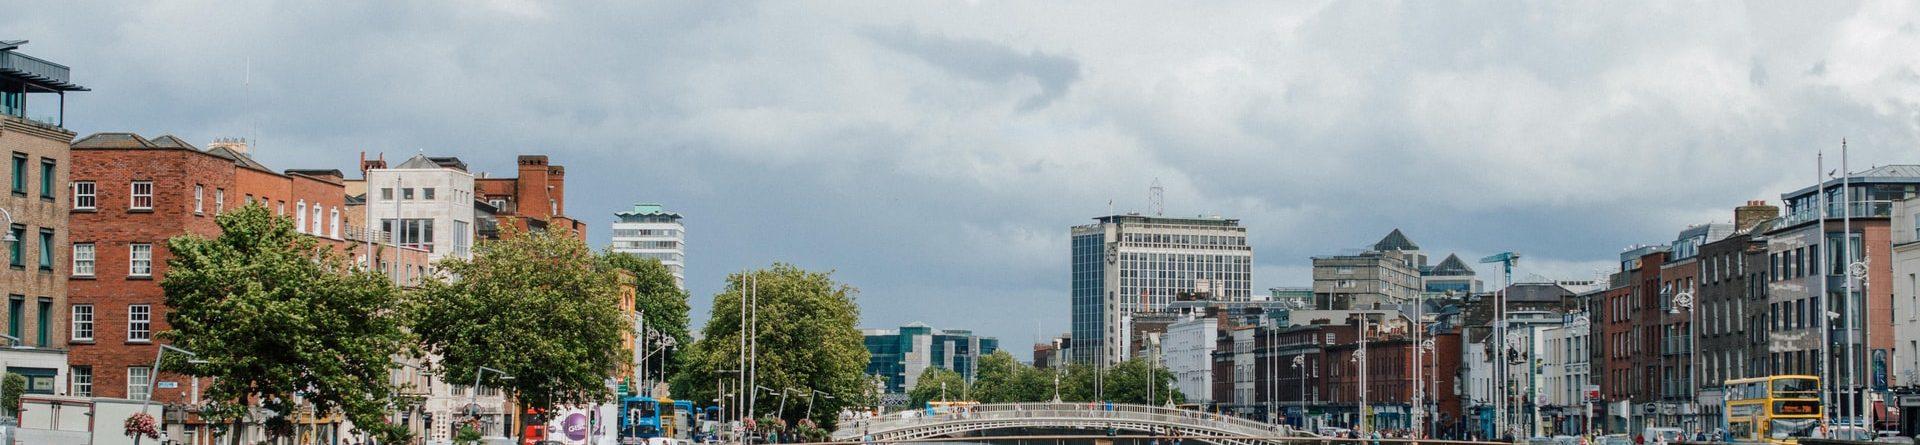 Учеба и переезд в Ирландию вместе с Kiwi Education